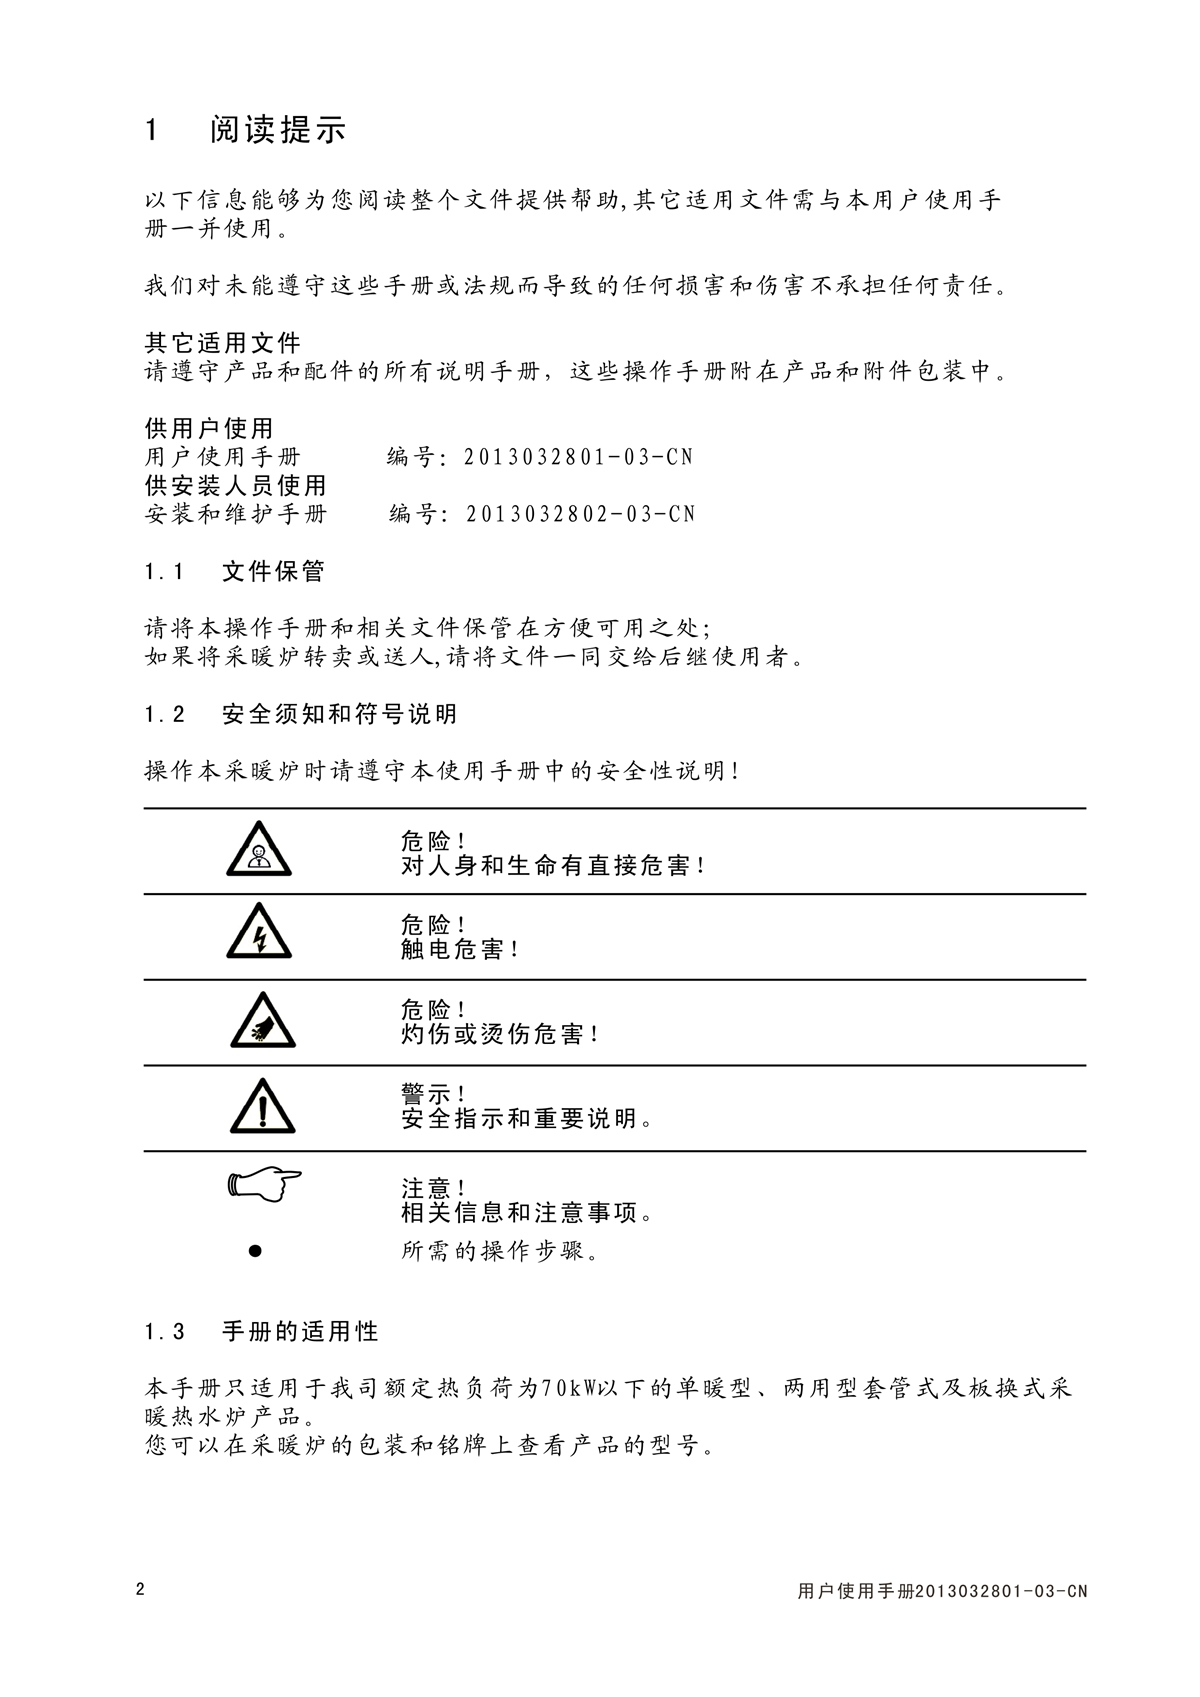 ES03系列-用户使用手册-3_01.jpg